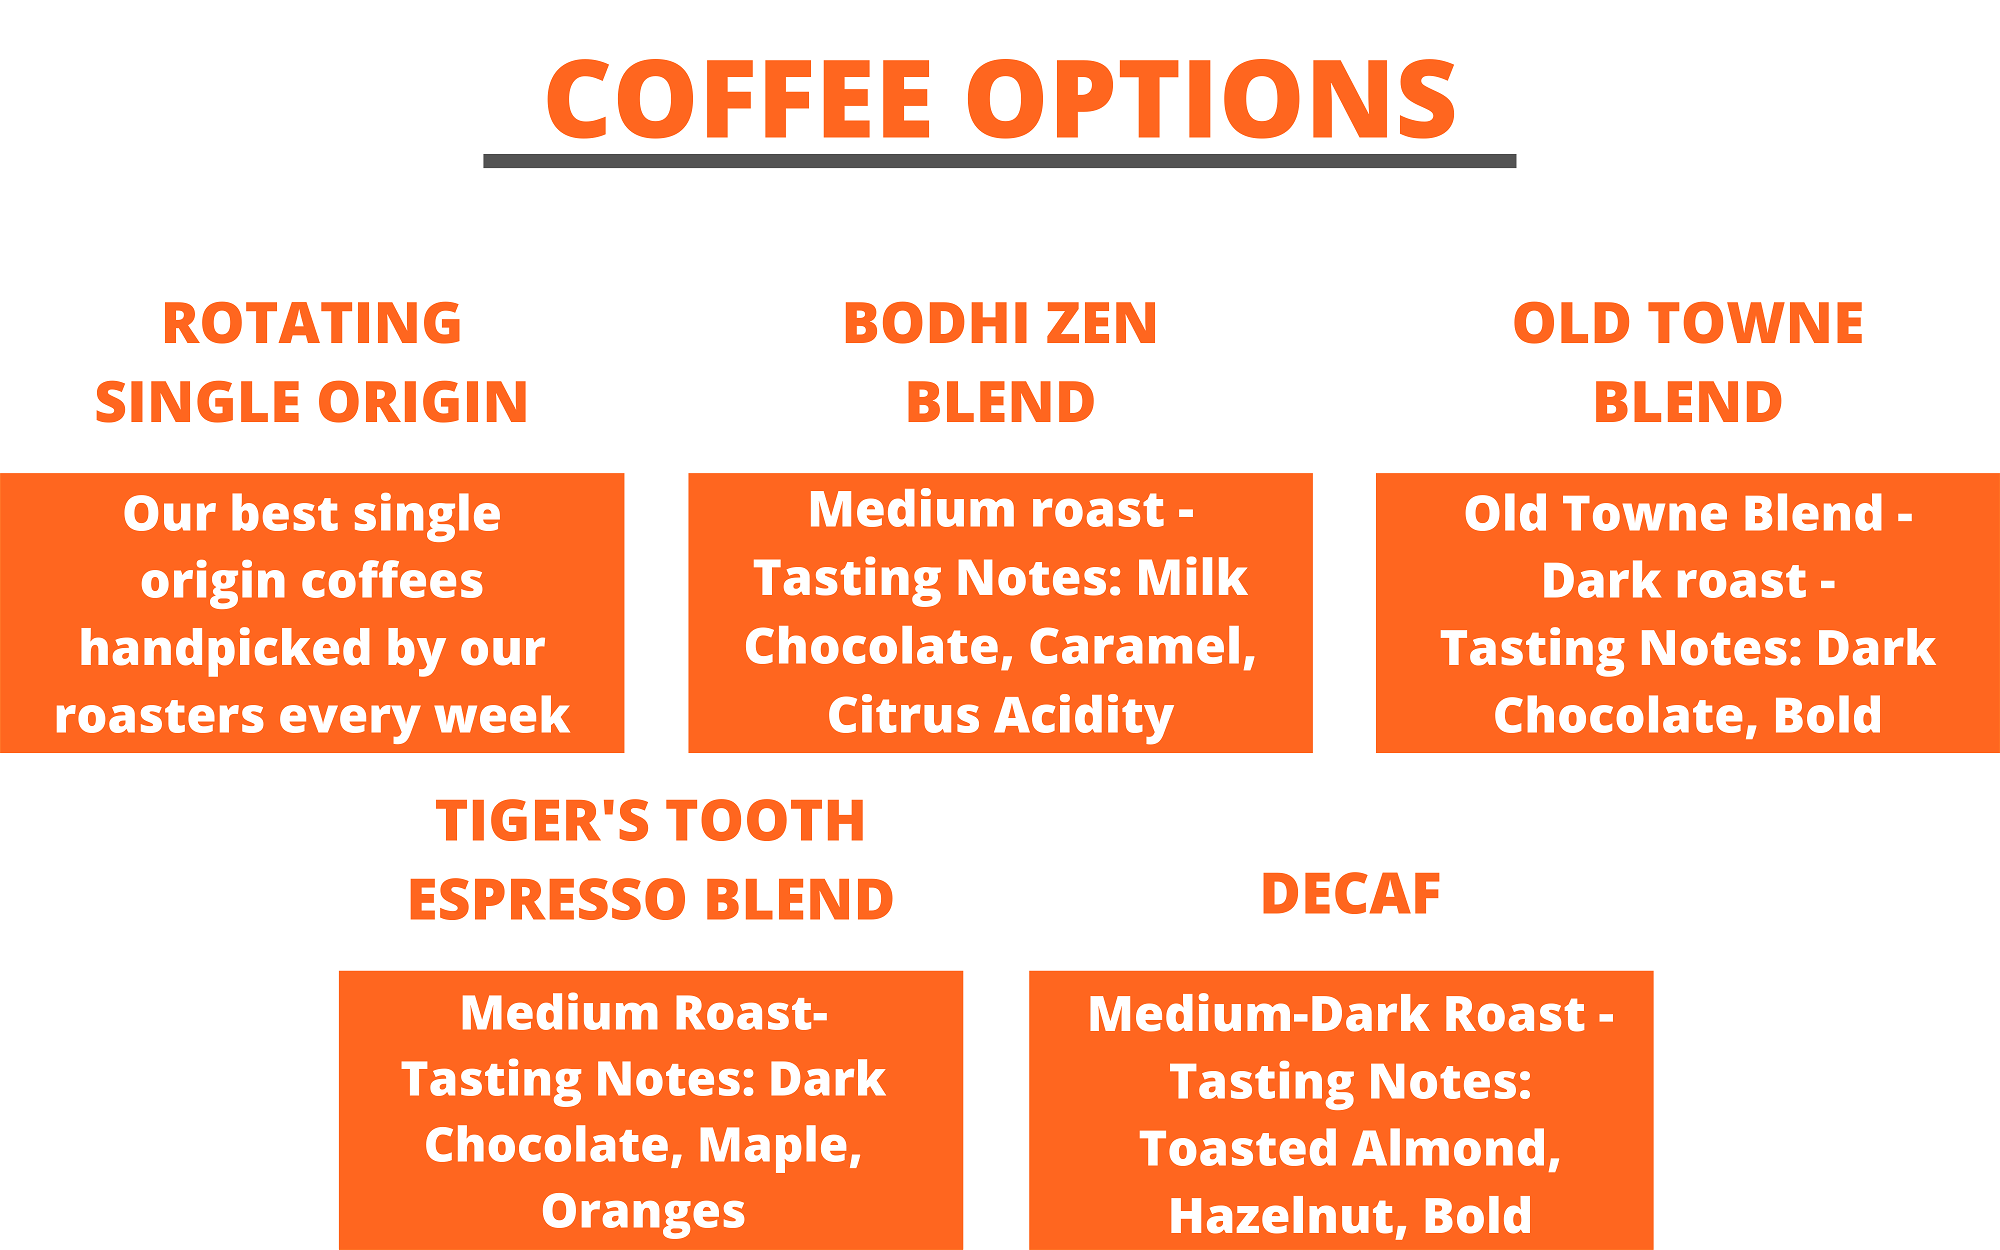 coffee options: rotating single origin, bodhi zen blend, old towne blend, tiger's tooth espresso blend, decaf